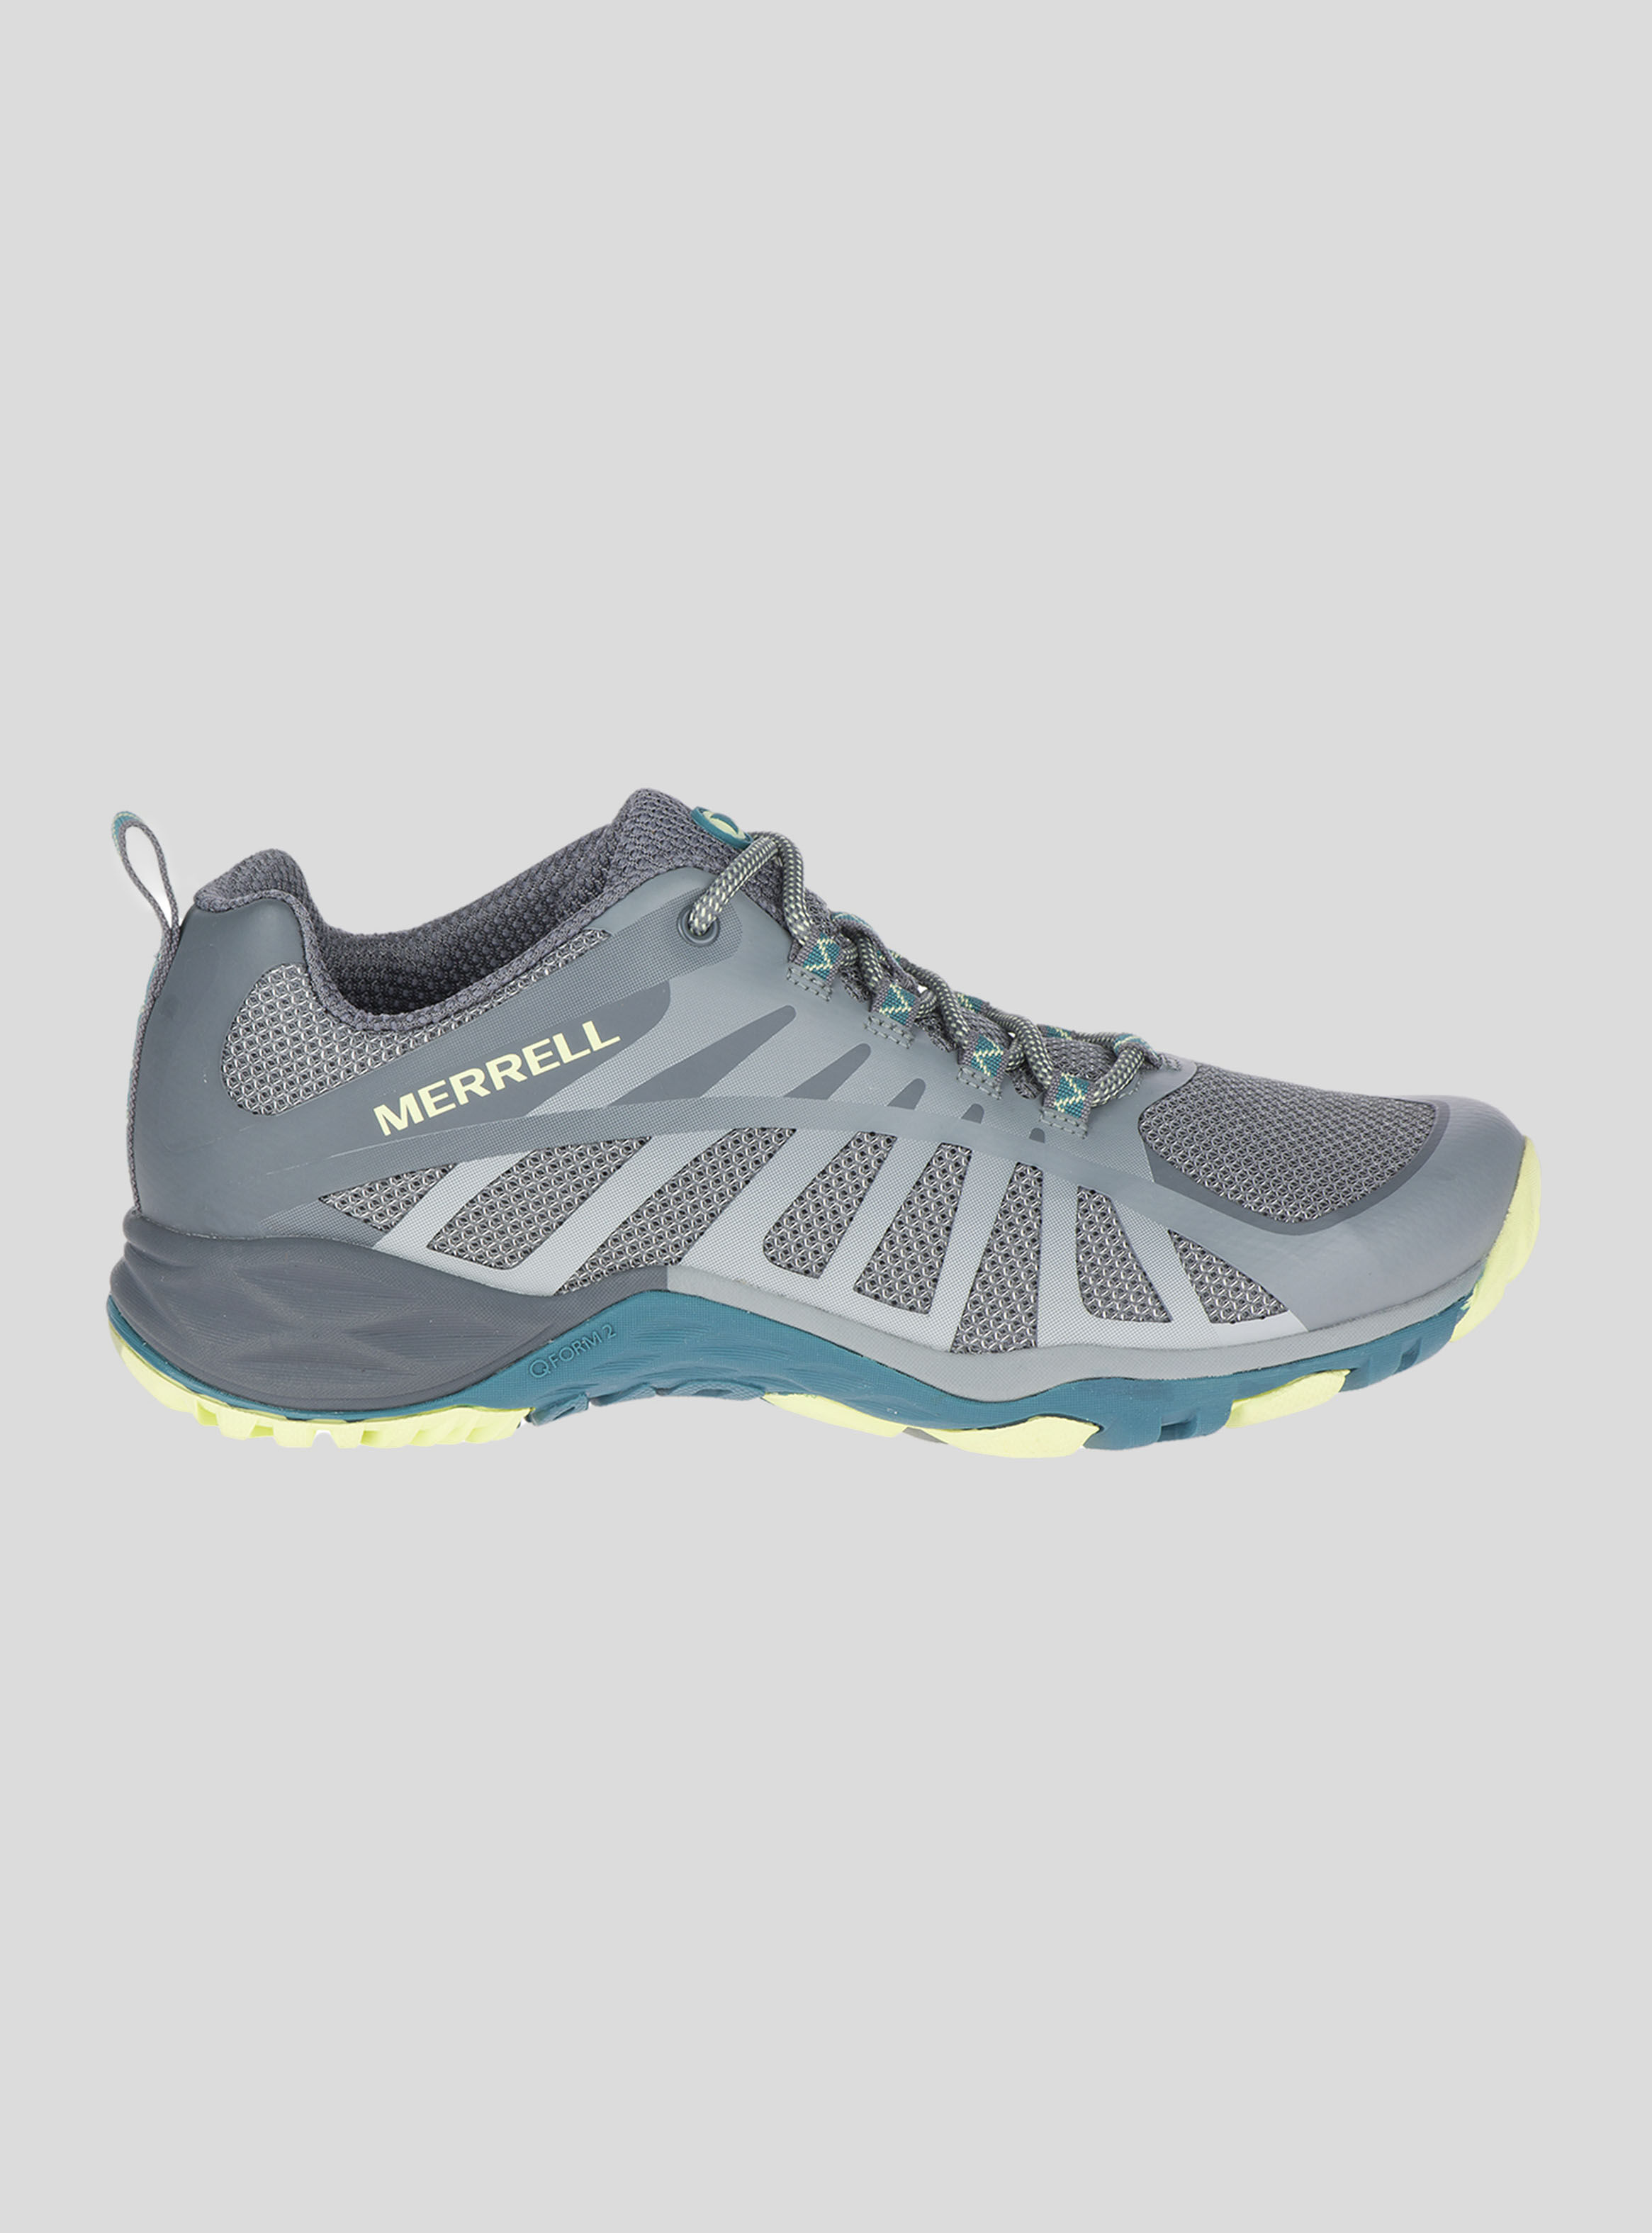 zapatos merrell cyberday life